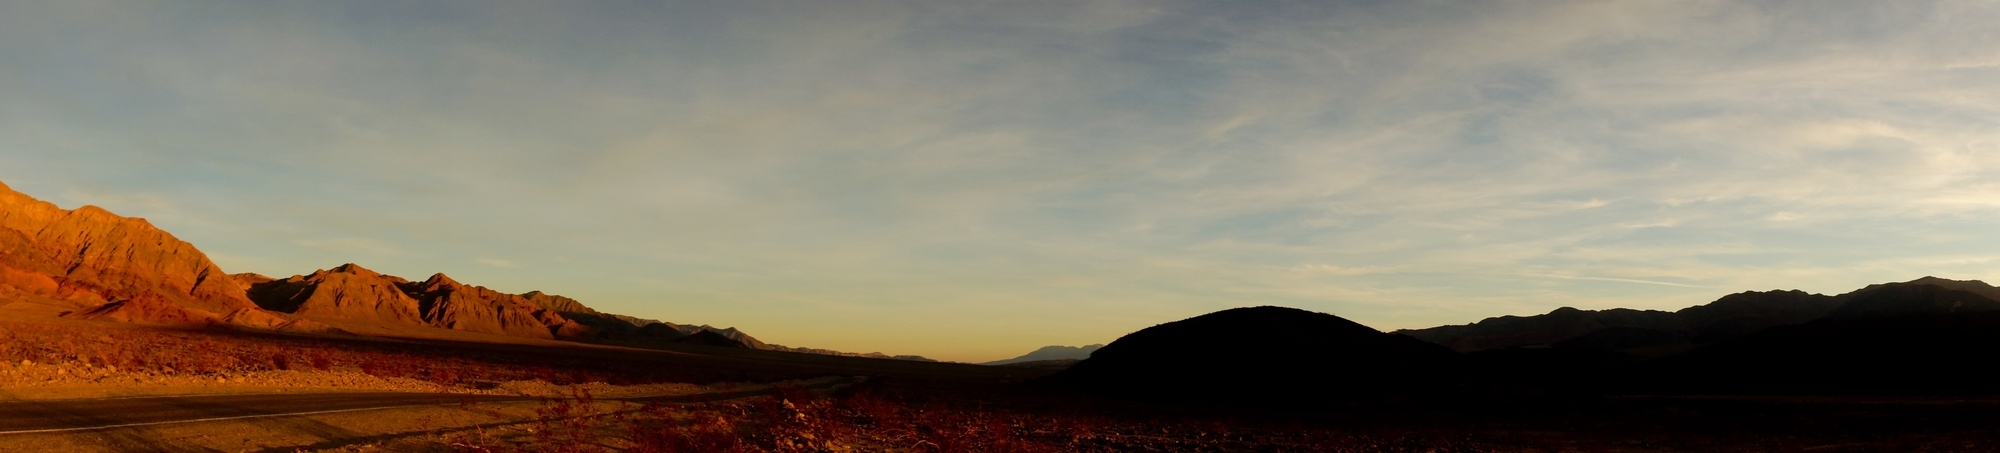 panorama-desert-death-valley-2013